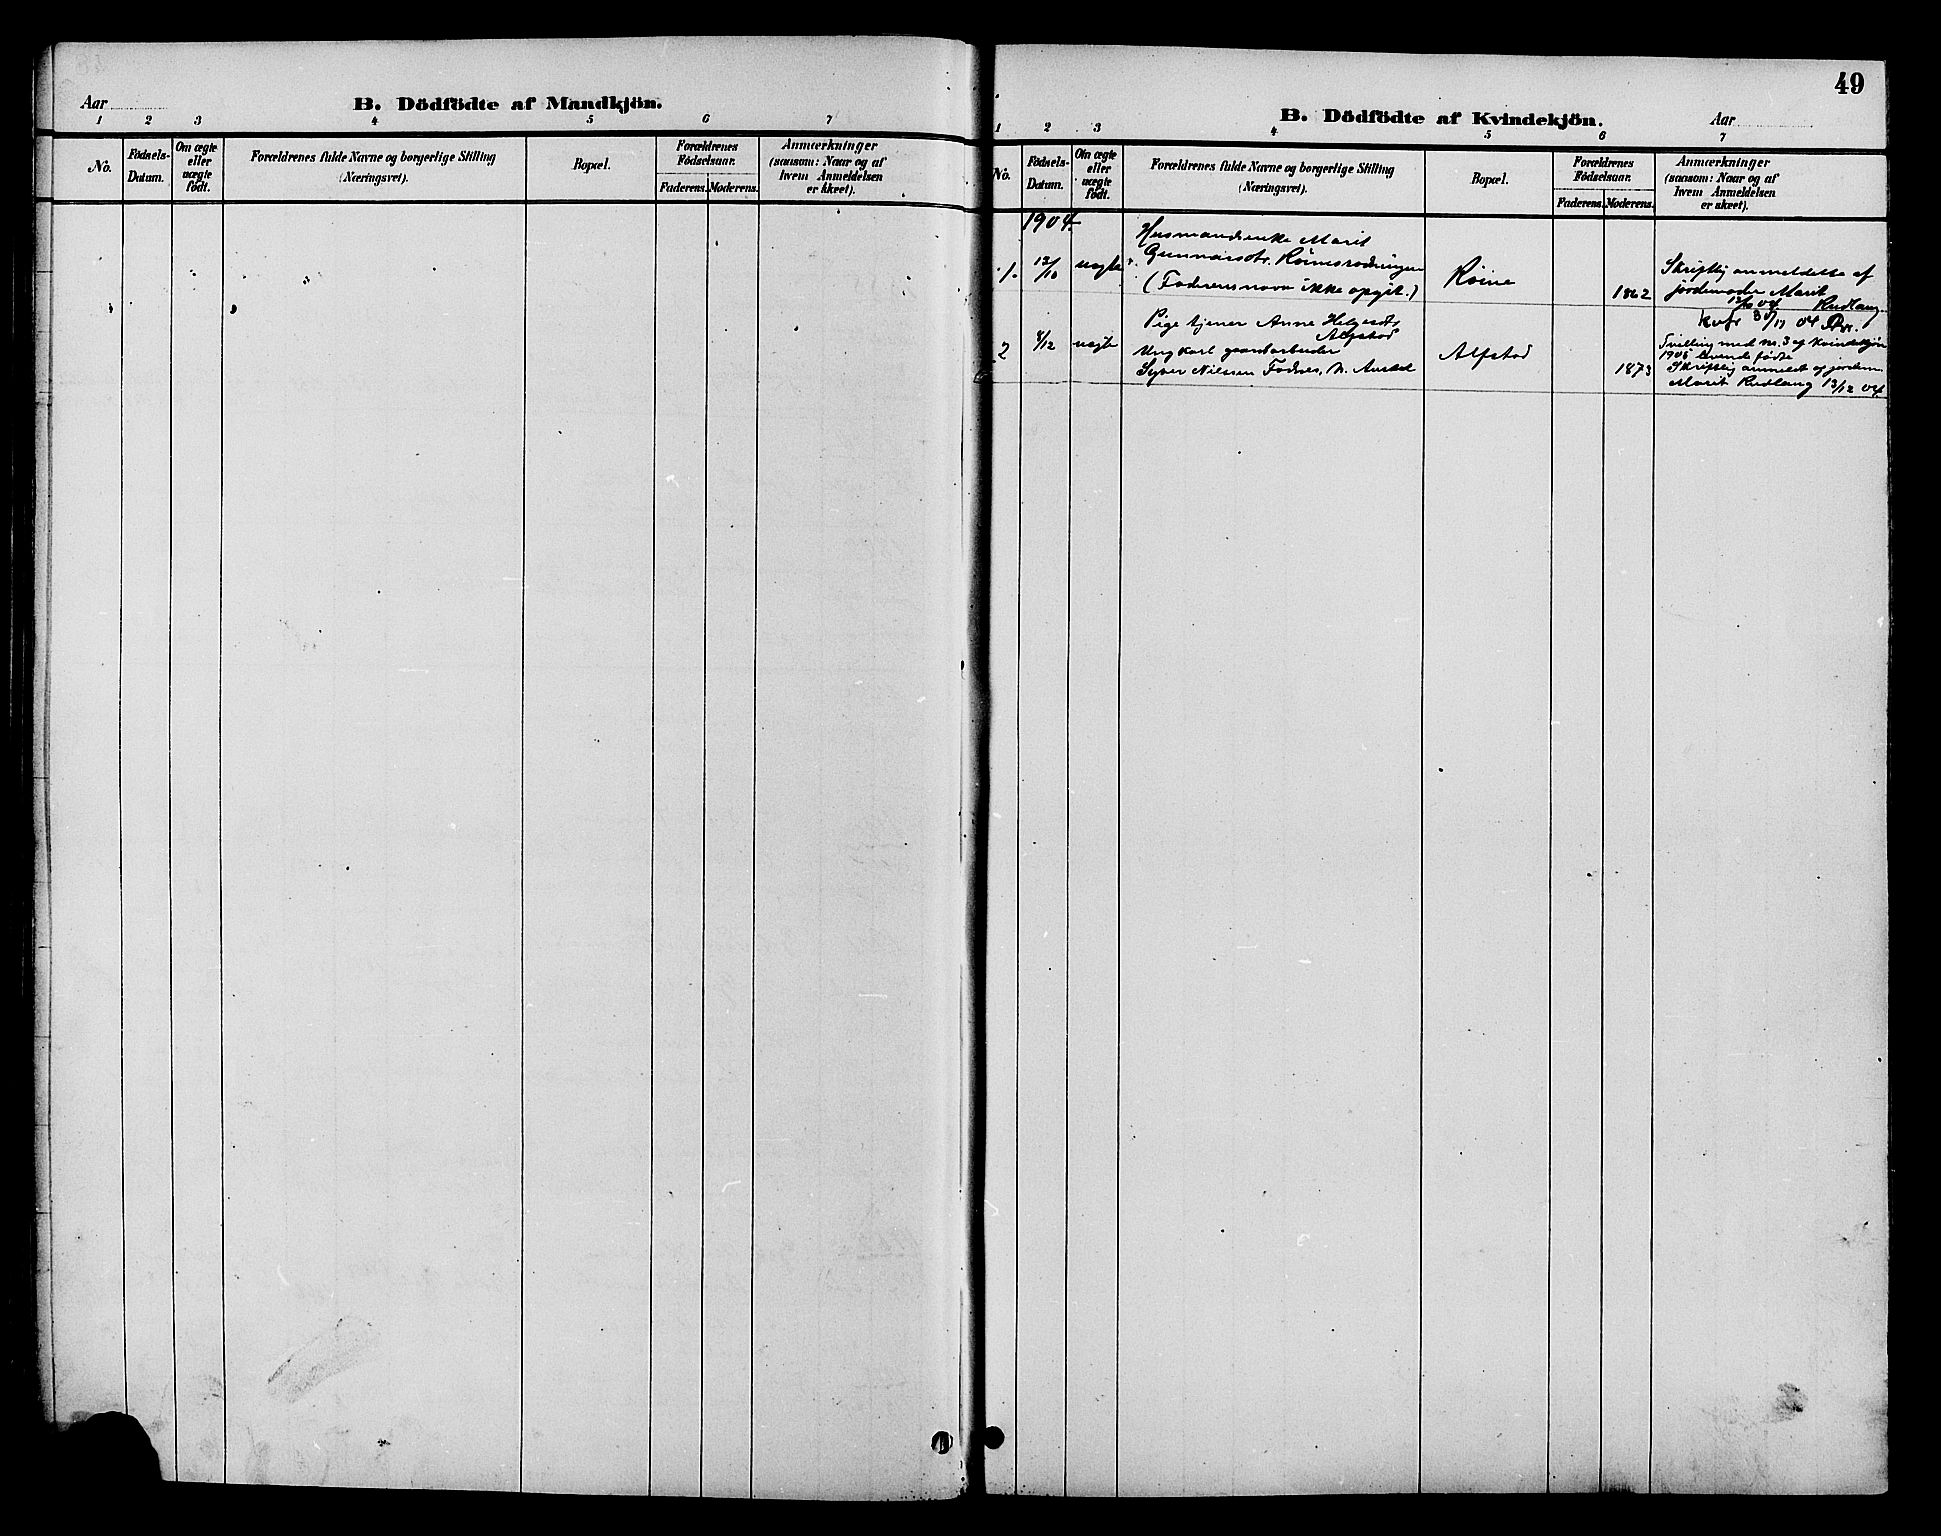 SAH, Øystre Slidre prestekontor, Klokkerbok nr. 4, 1887-1907, s. 49